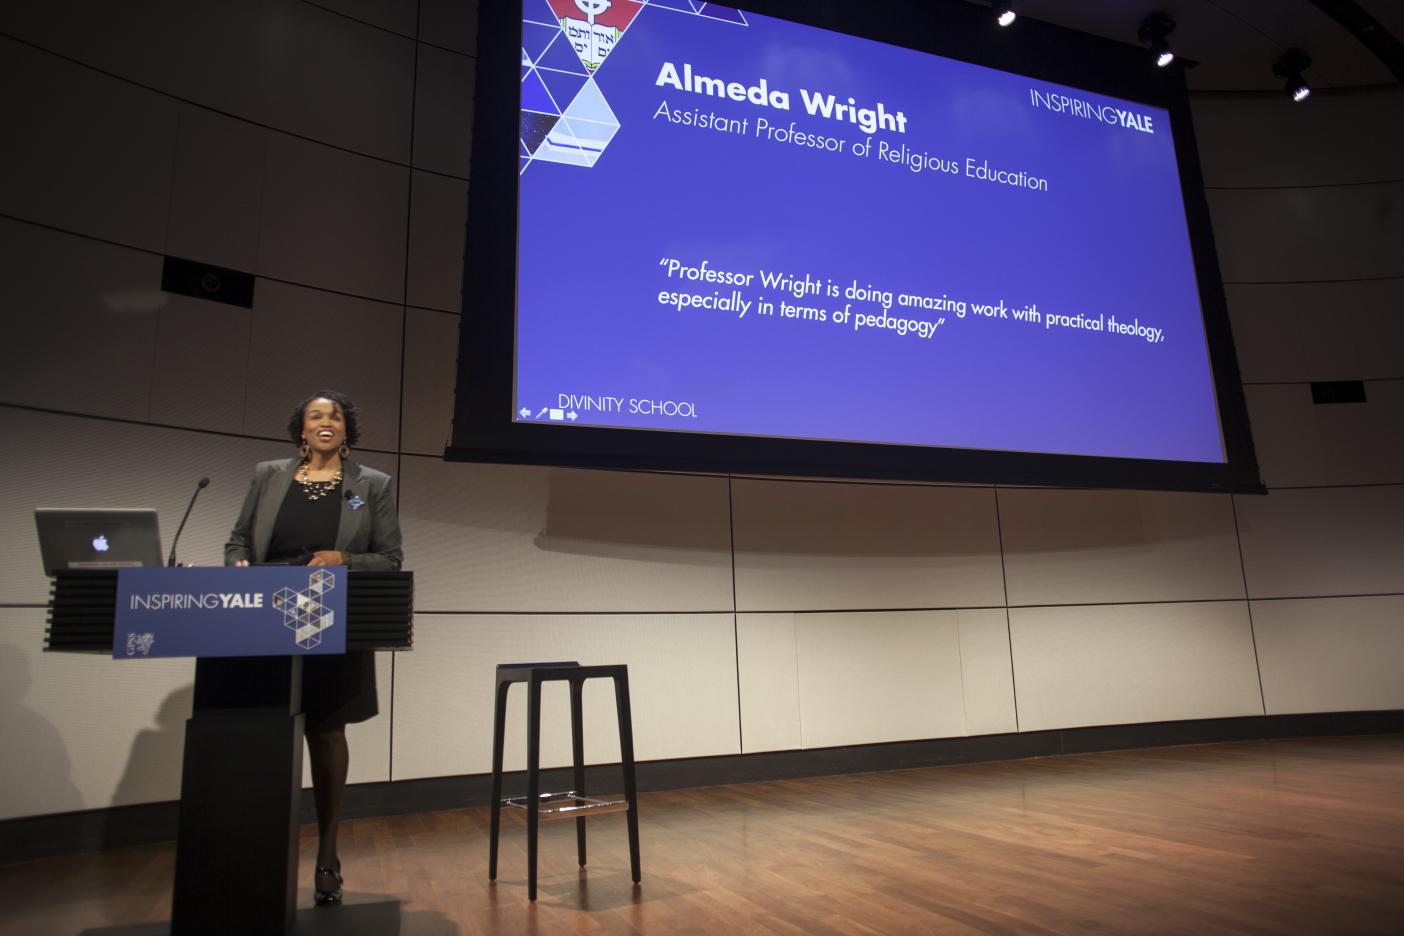 Almeda Wright